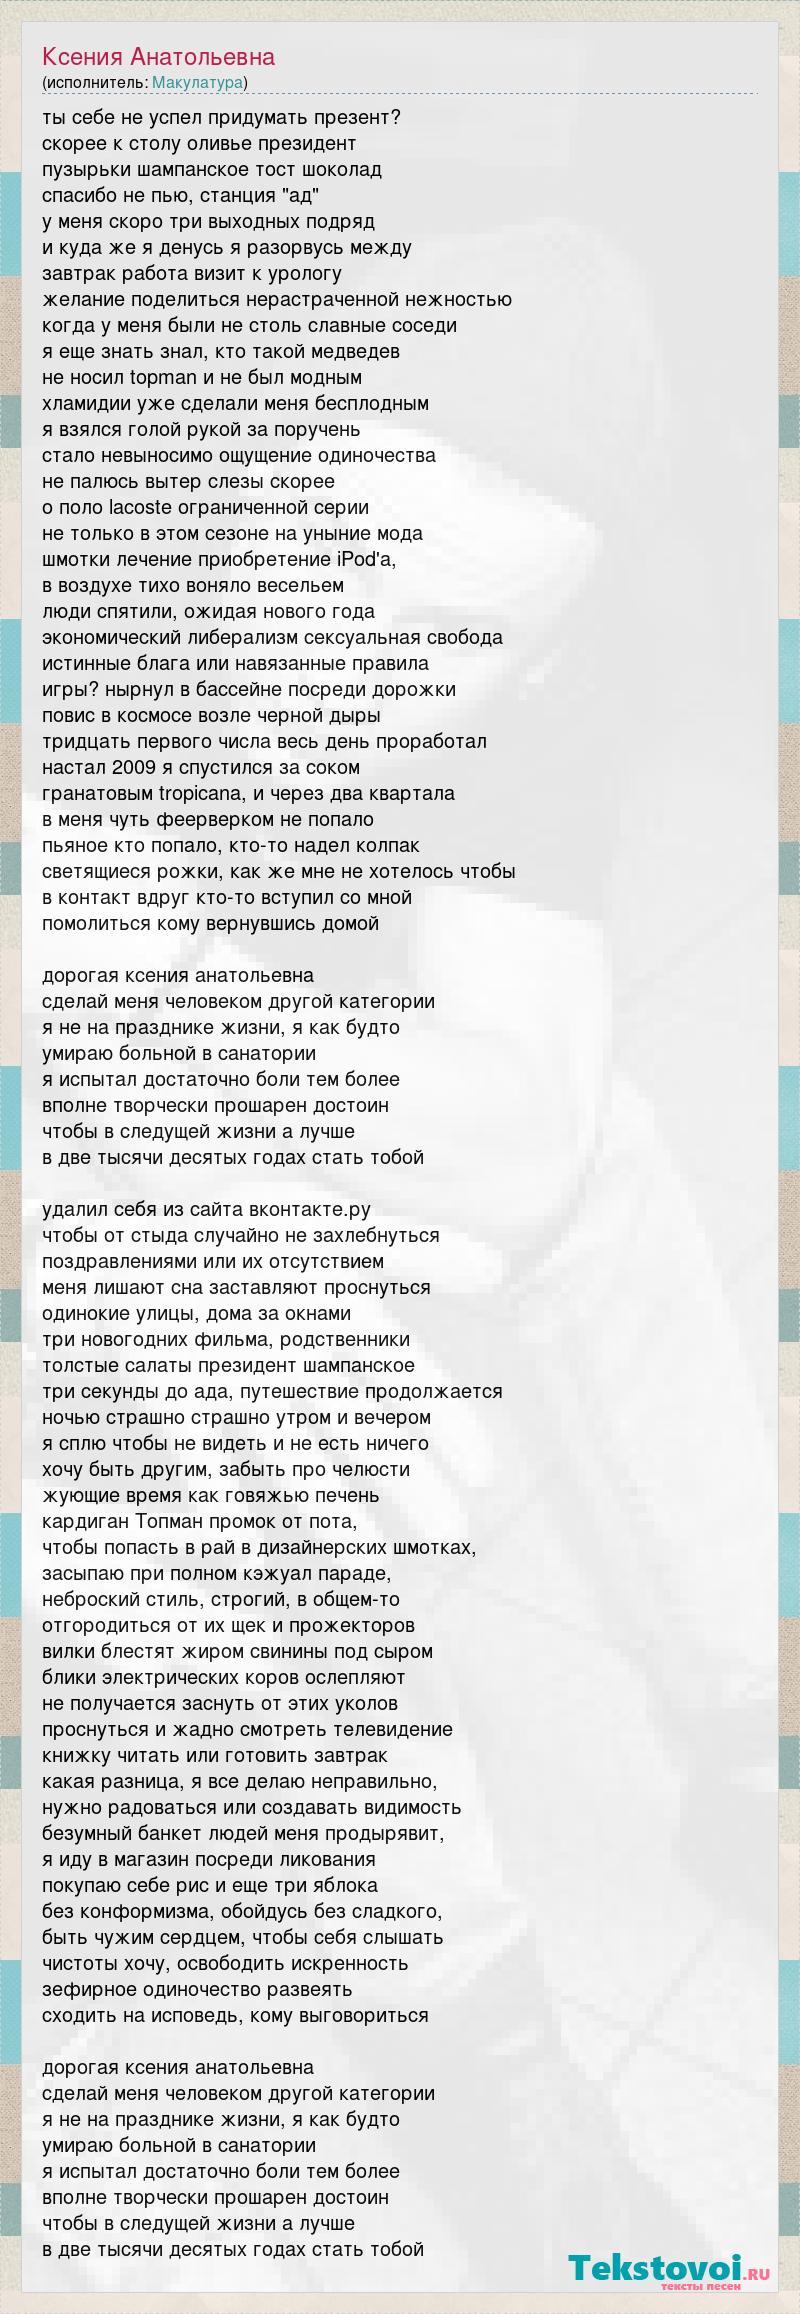 Ксения анатольевна макулатура текст пункт приема макулатуры цена за кг в краснодаре